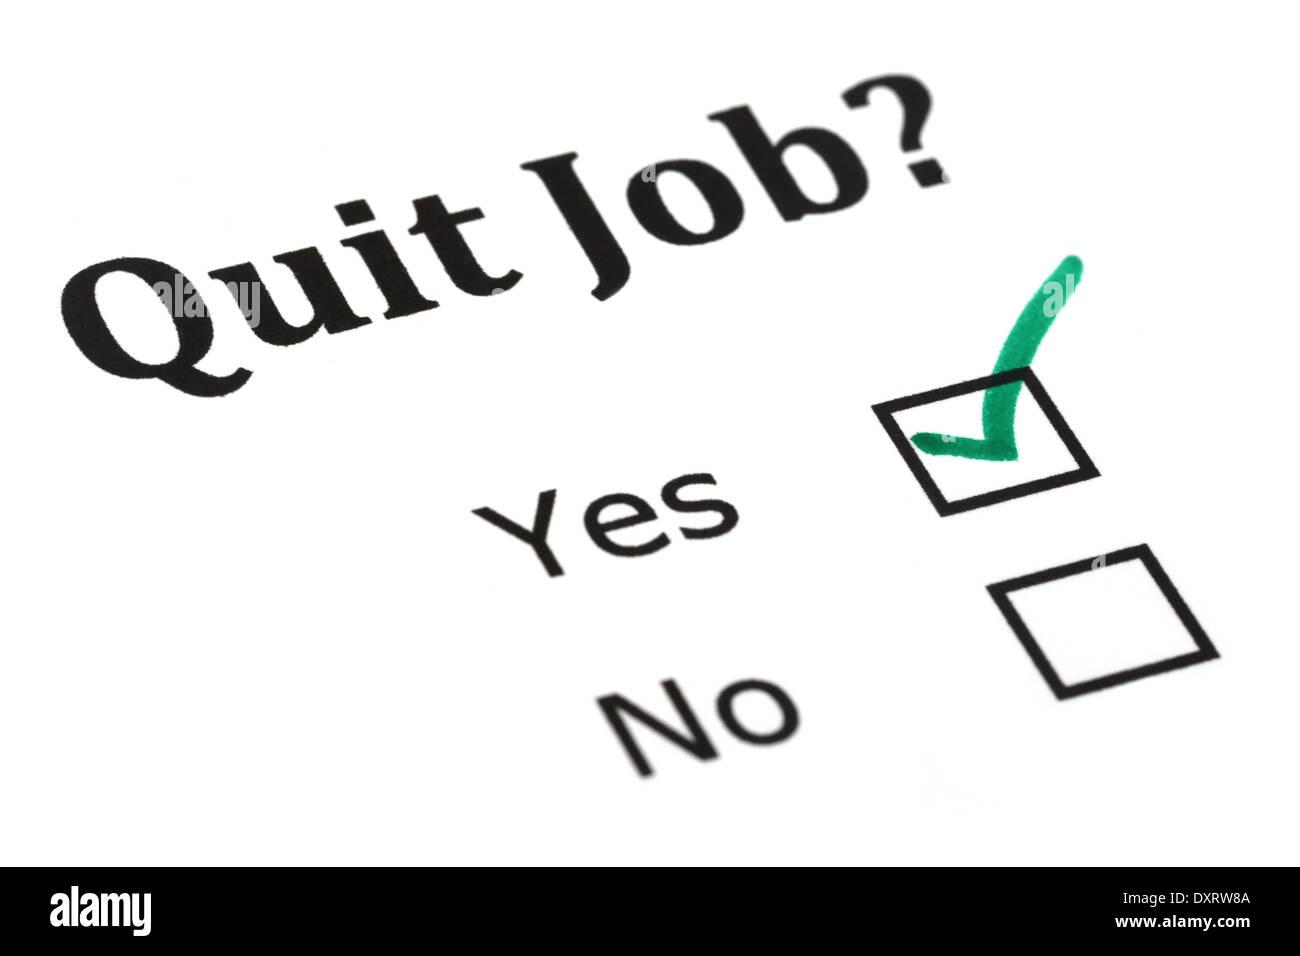 Quit job check mark on white paper - Stock Image